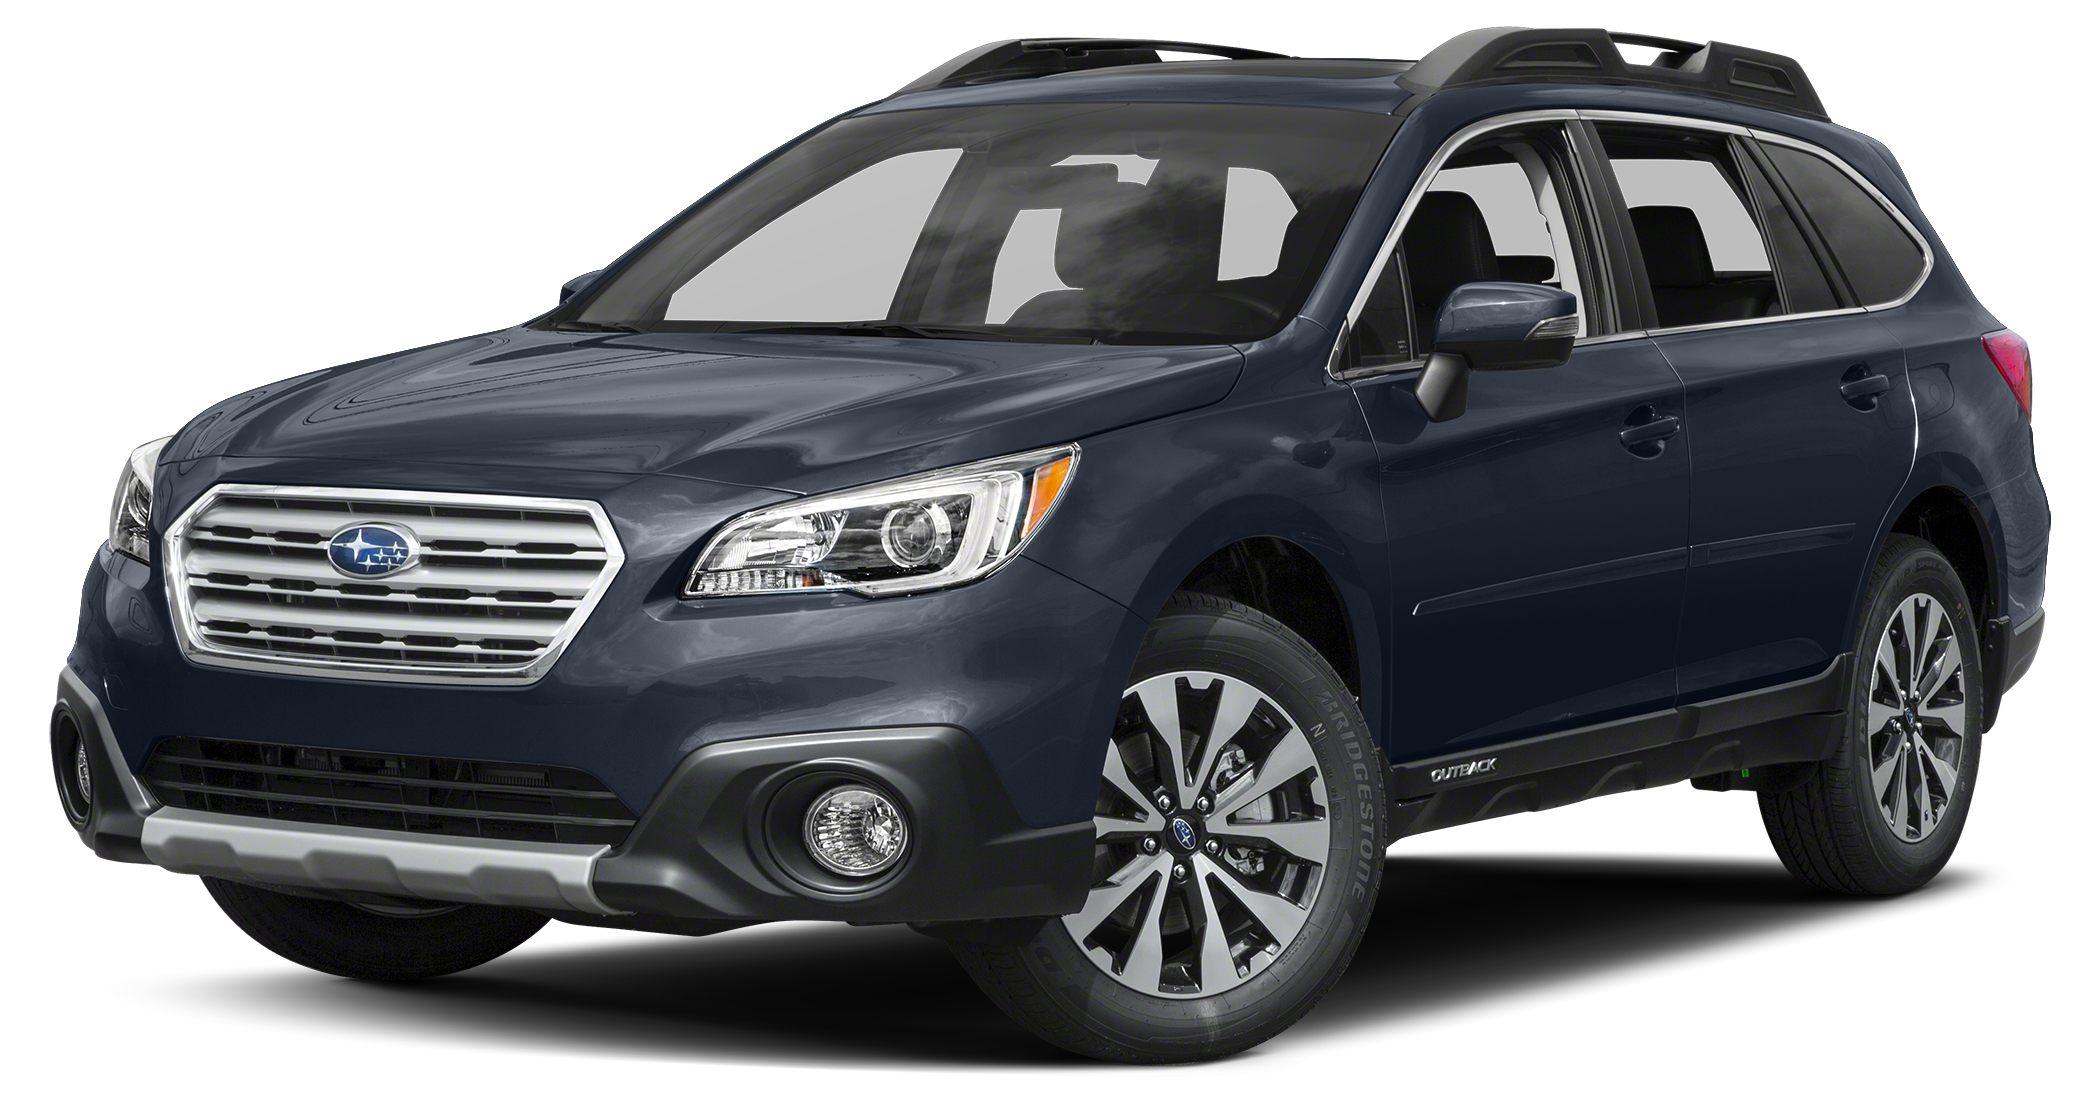 2017 Subaru Outback 36R Limited Miles 5Color Twilight Blue Metallic Stock SH232486 VIN 4S4B